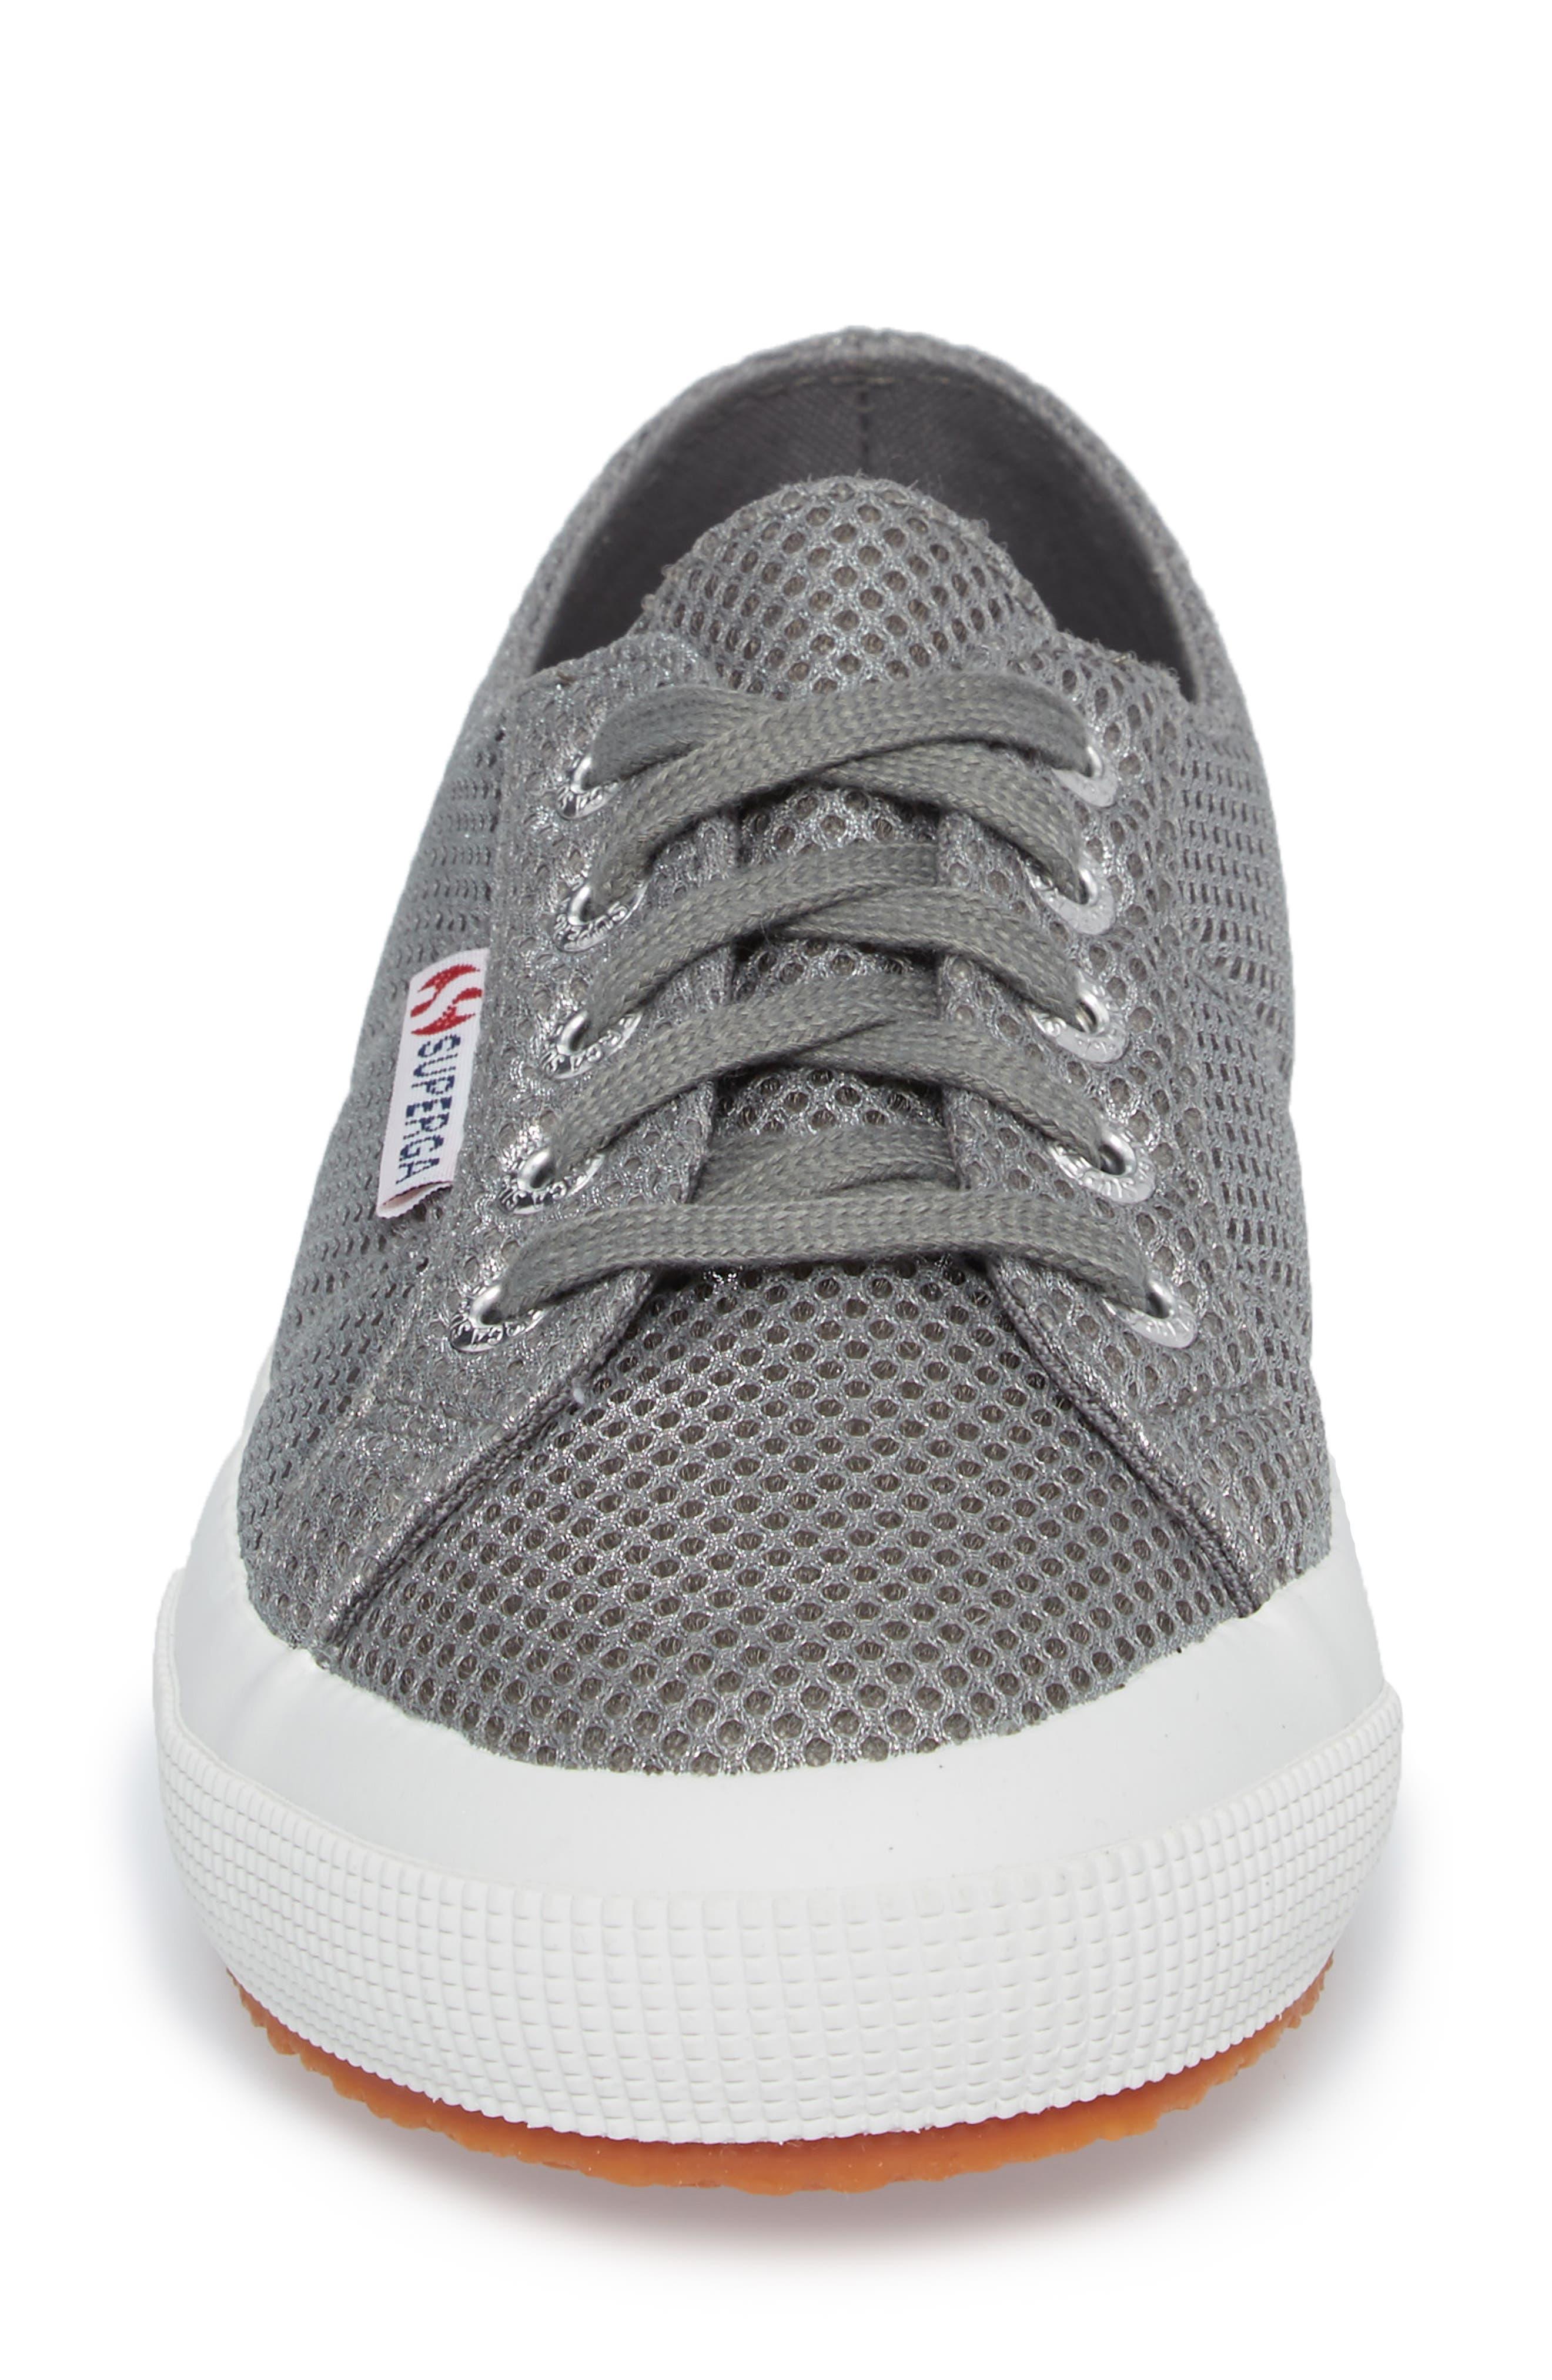 2750 Metallic Sneaker,                             Alternate thumbnail 4, color,                             044